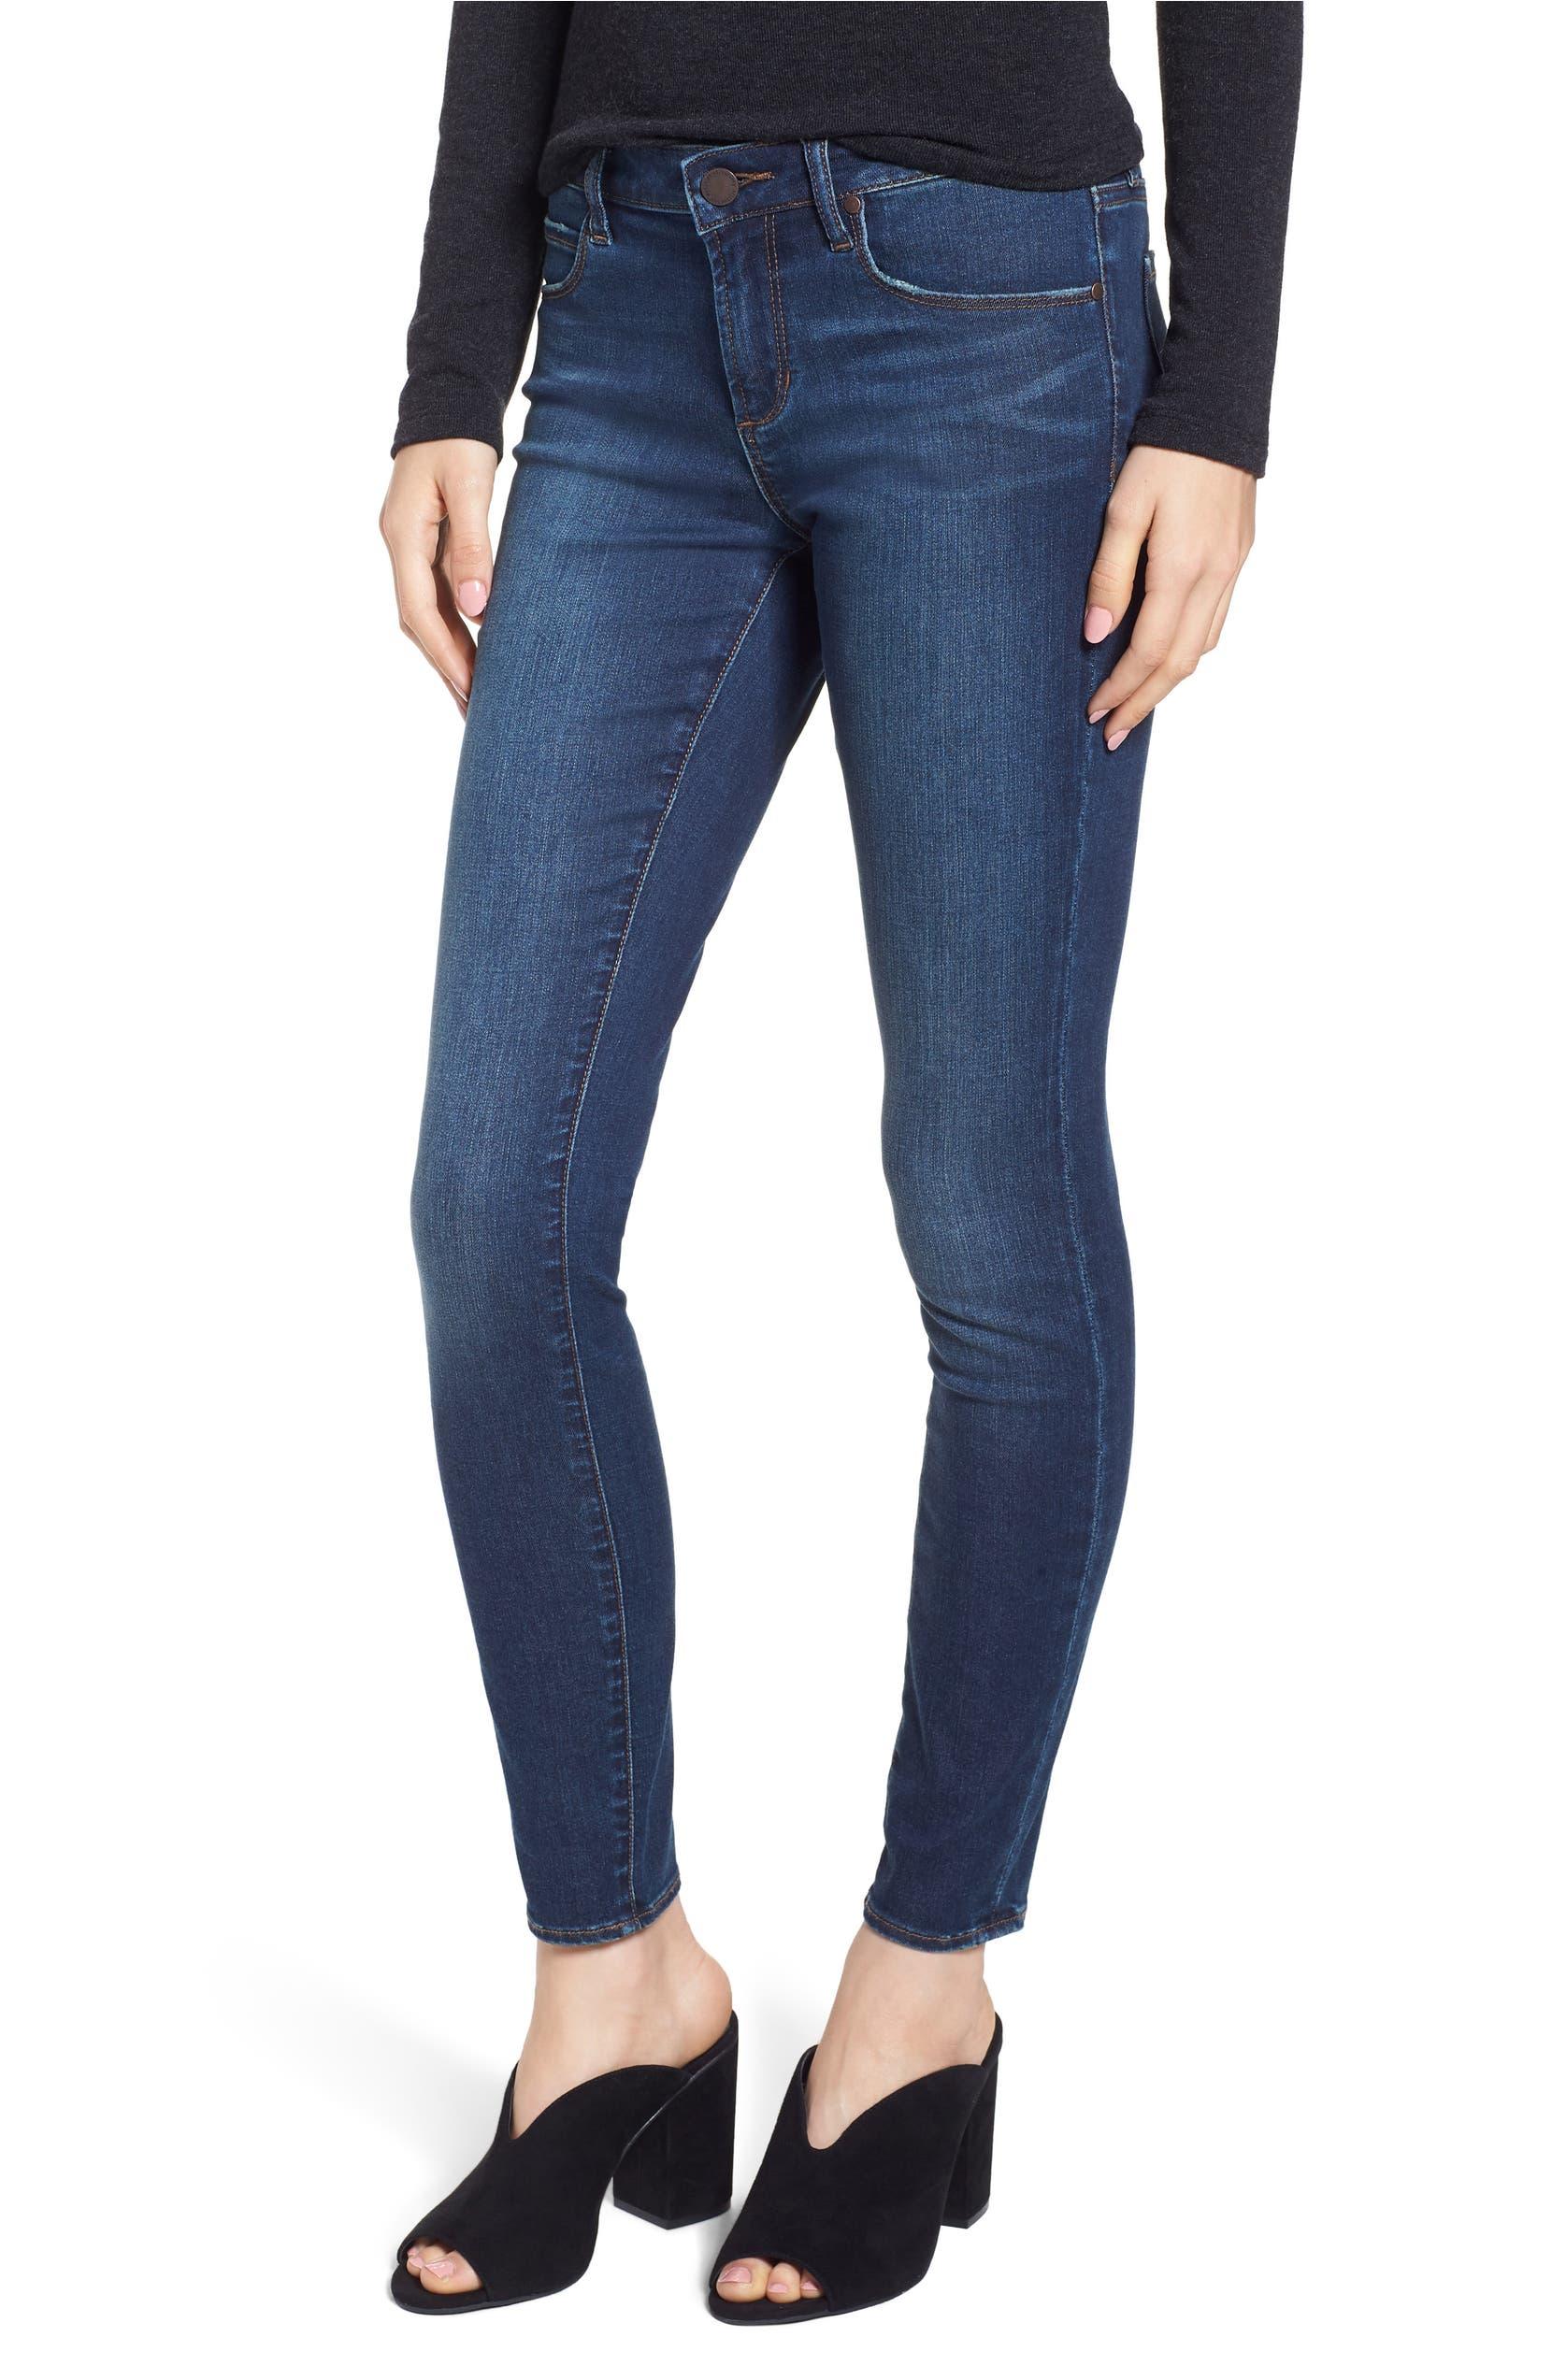 8715502750 Articles of Society Sarah Skinny Jeans (Silver Lake)